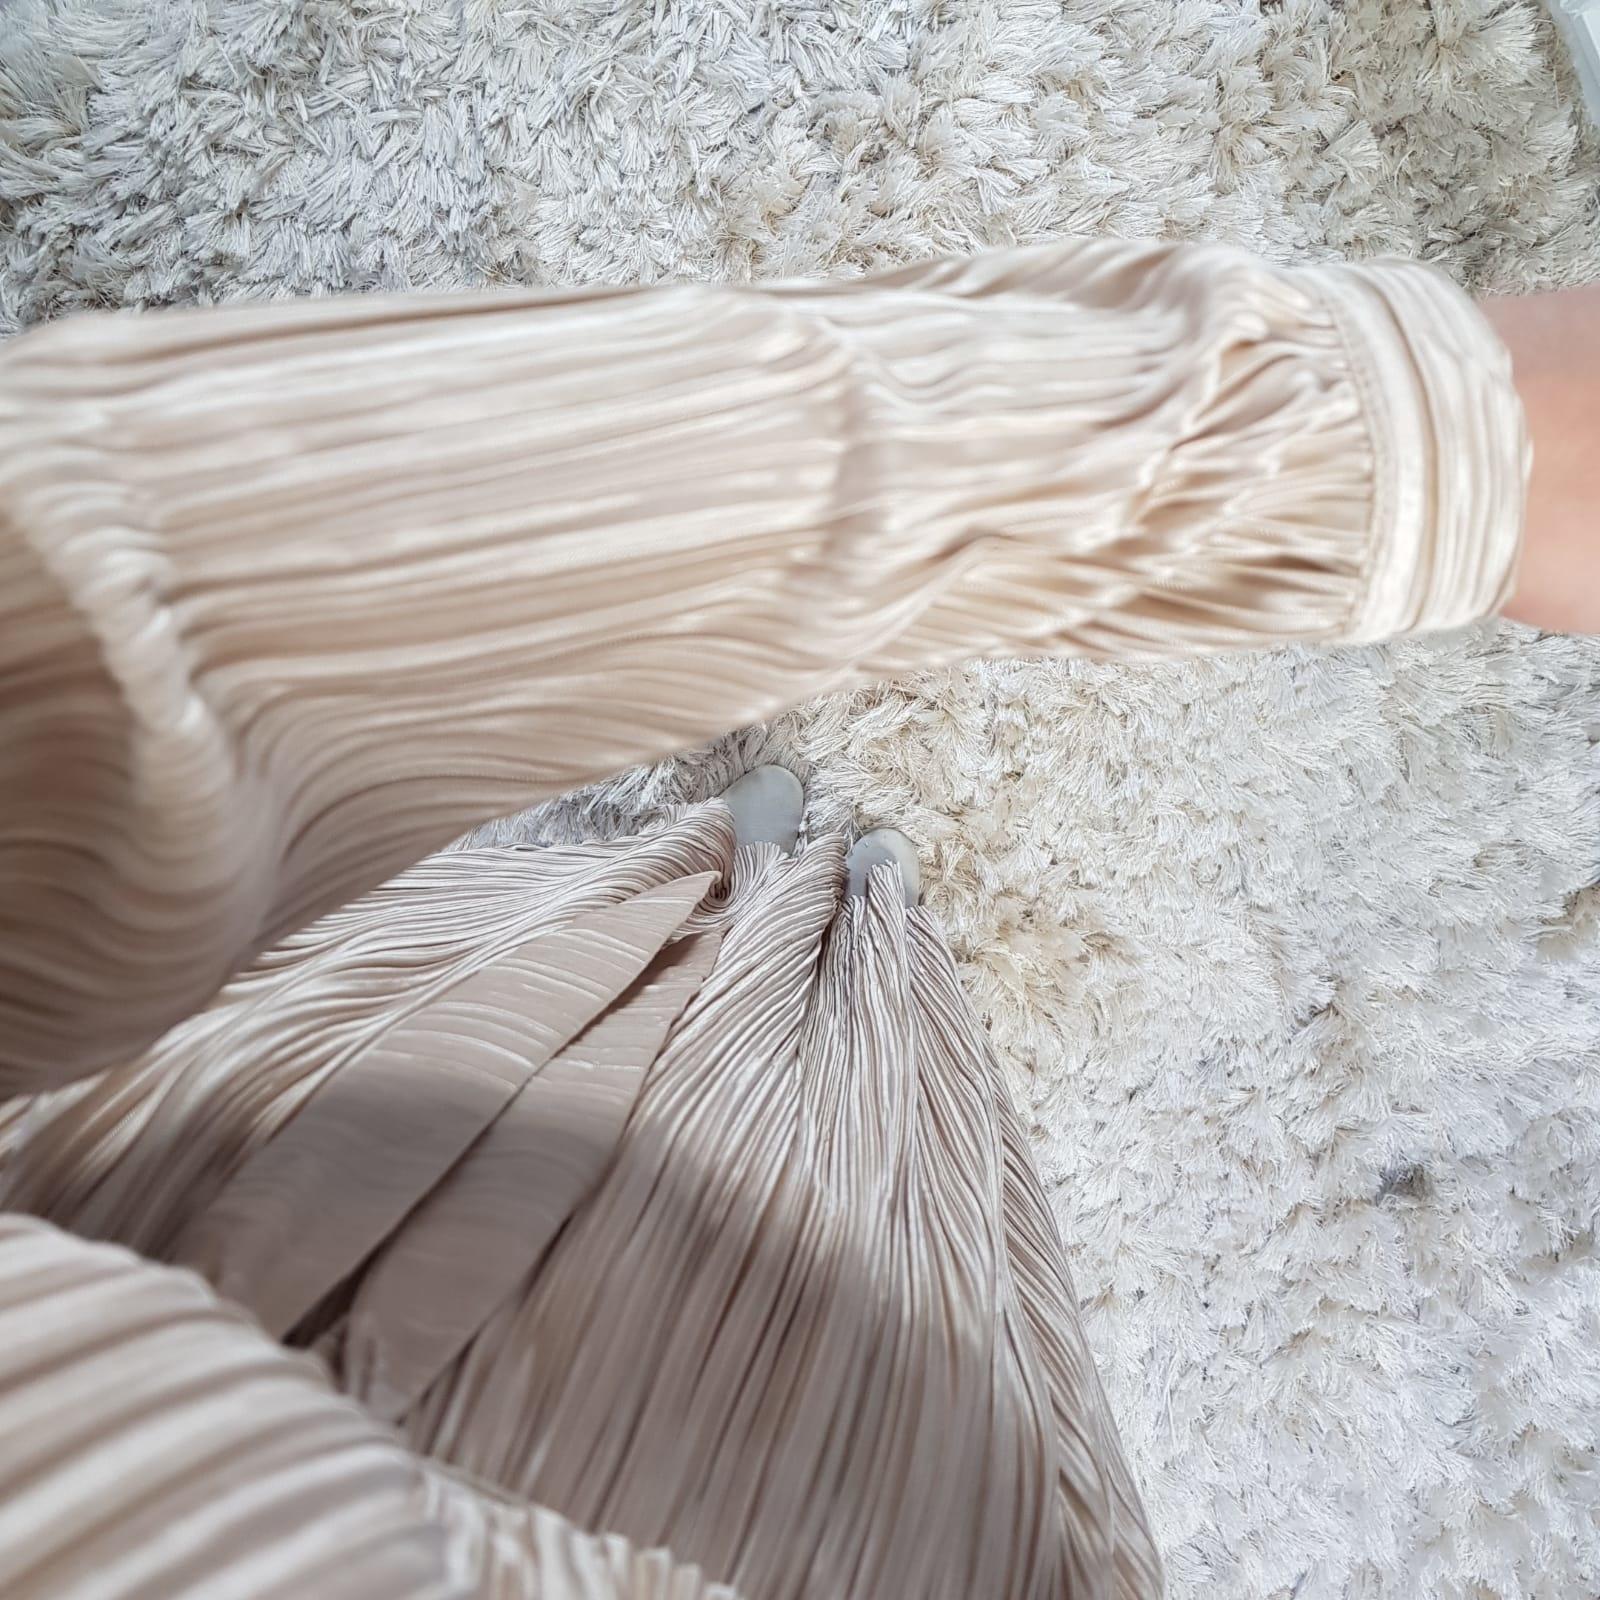 pleated dress amantea beige